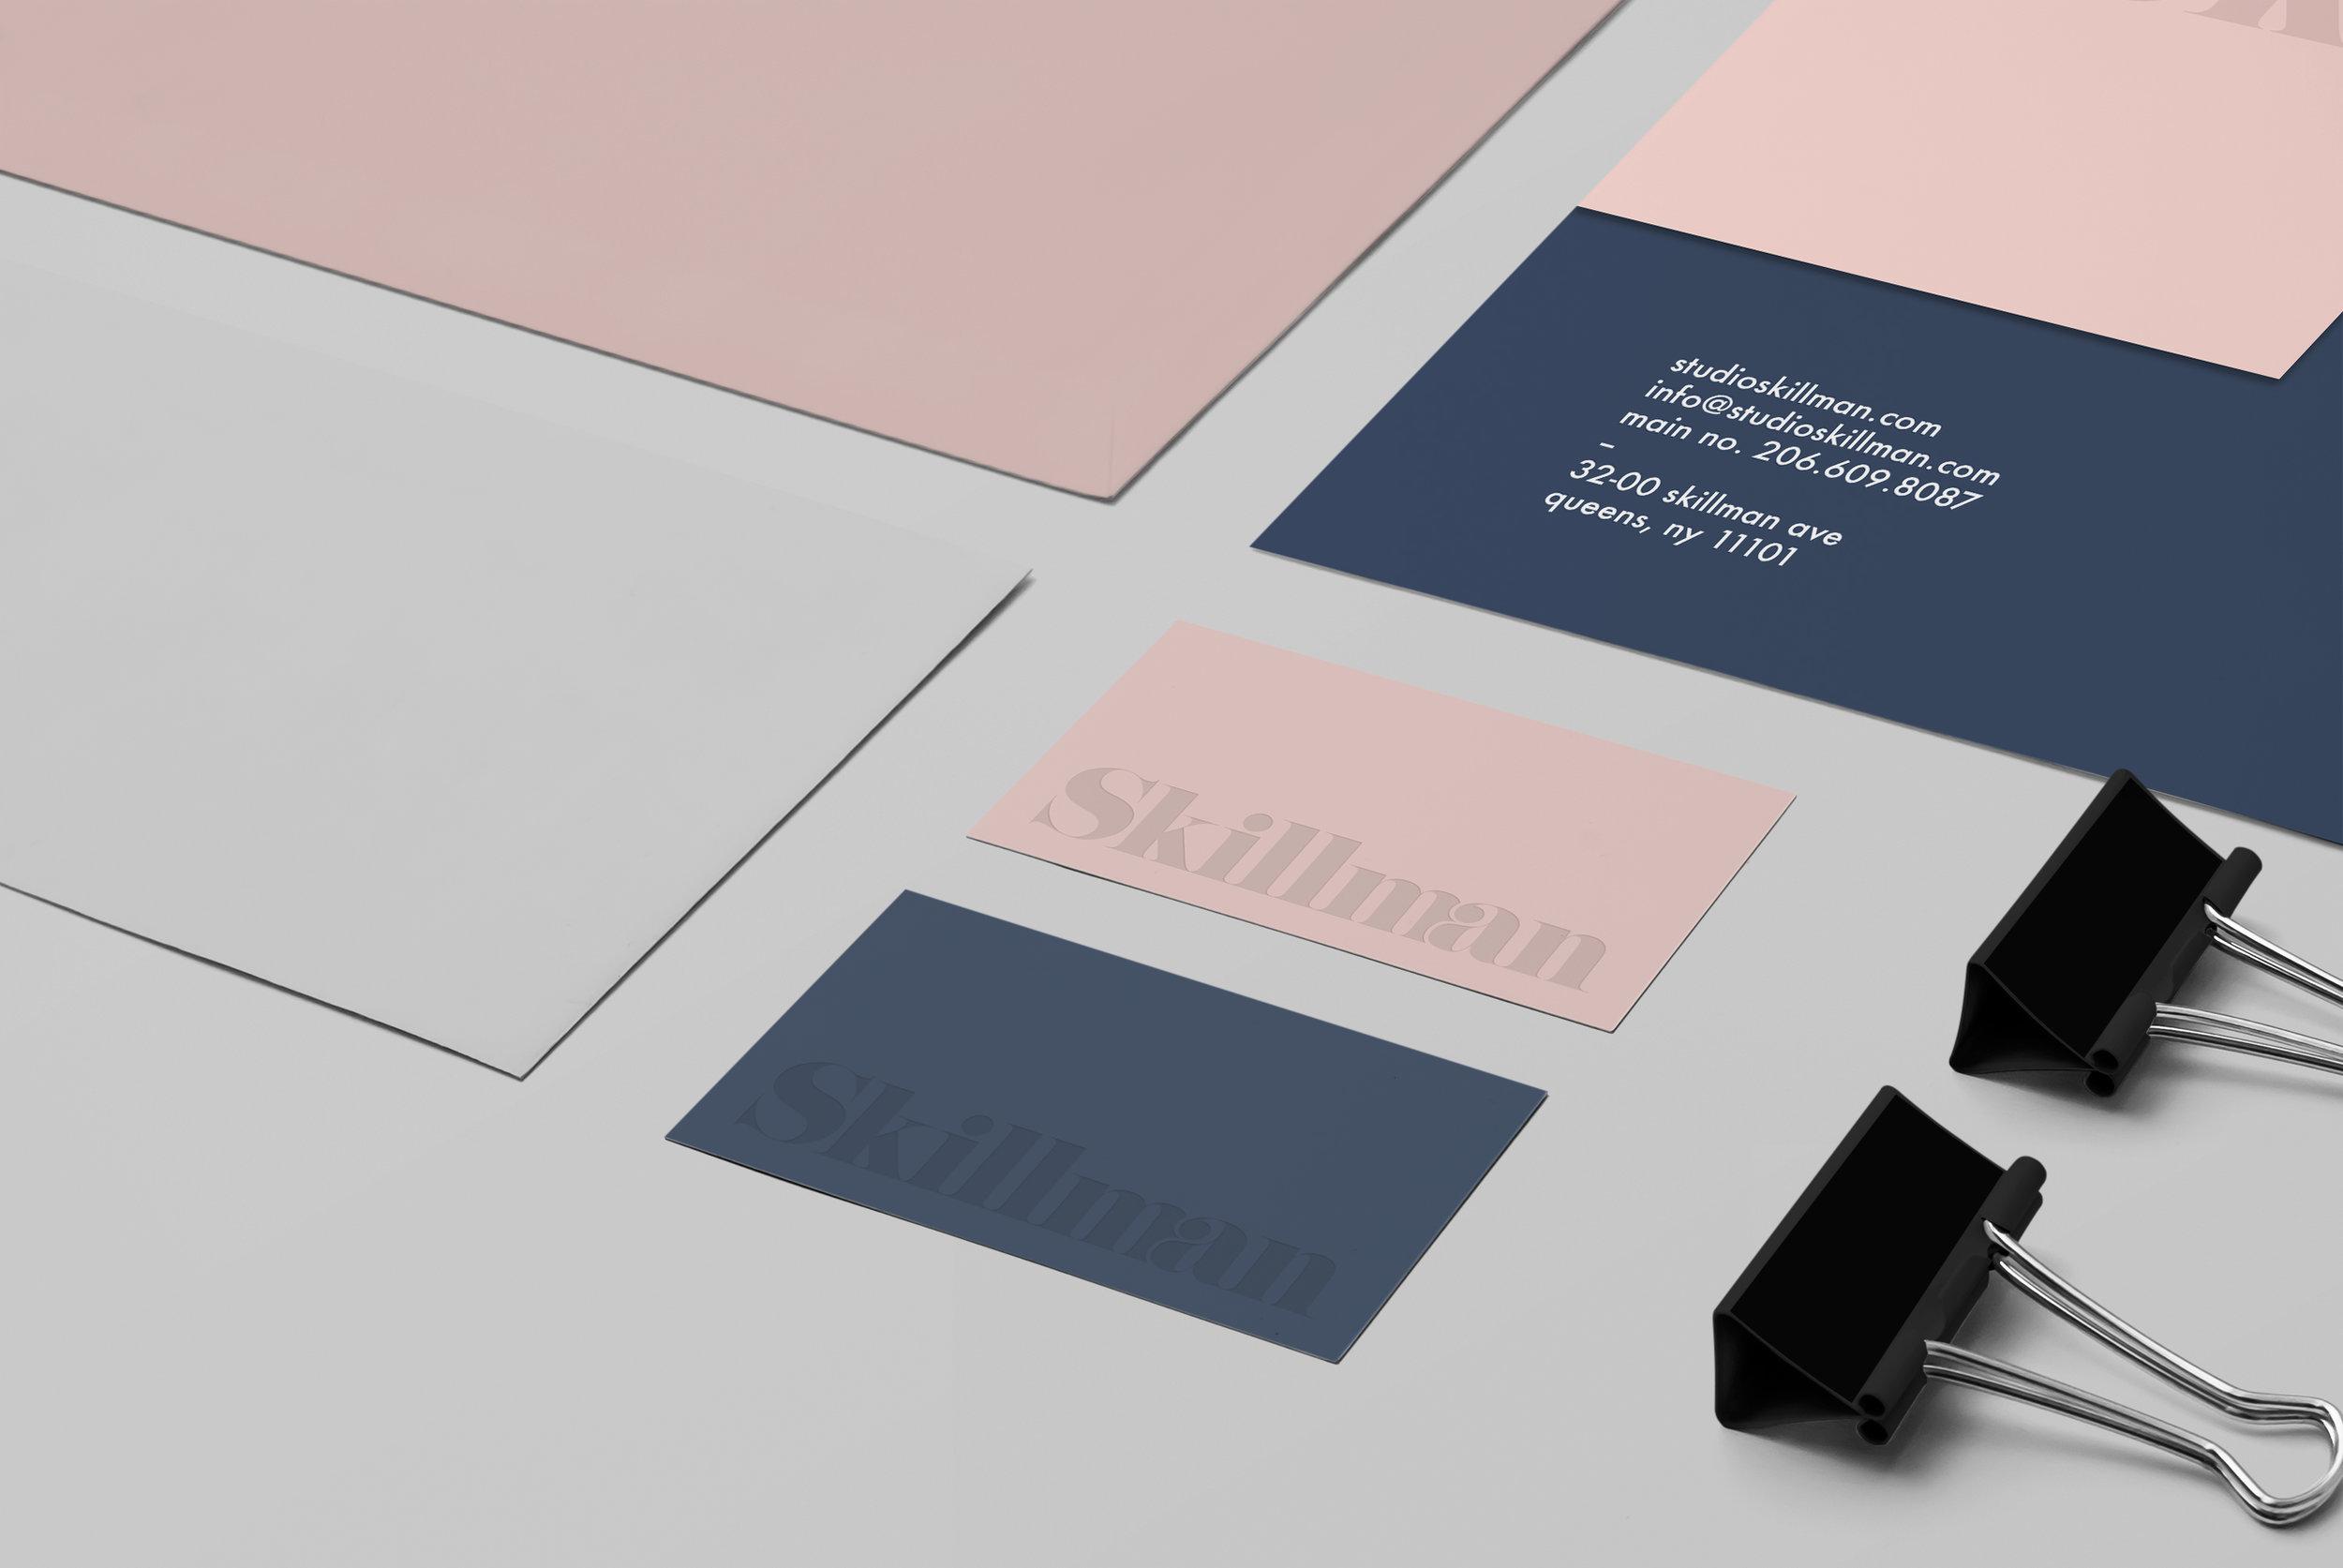 Studio_Bloq-Skillman-3.jpg